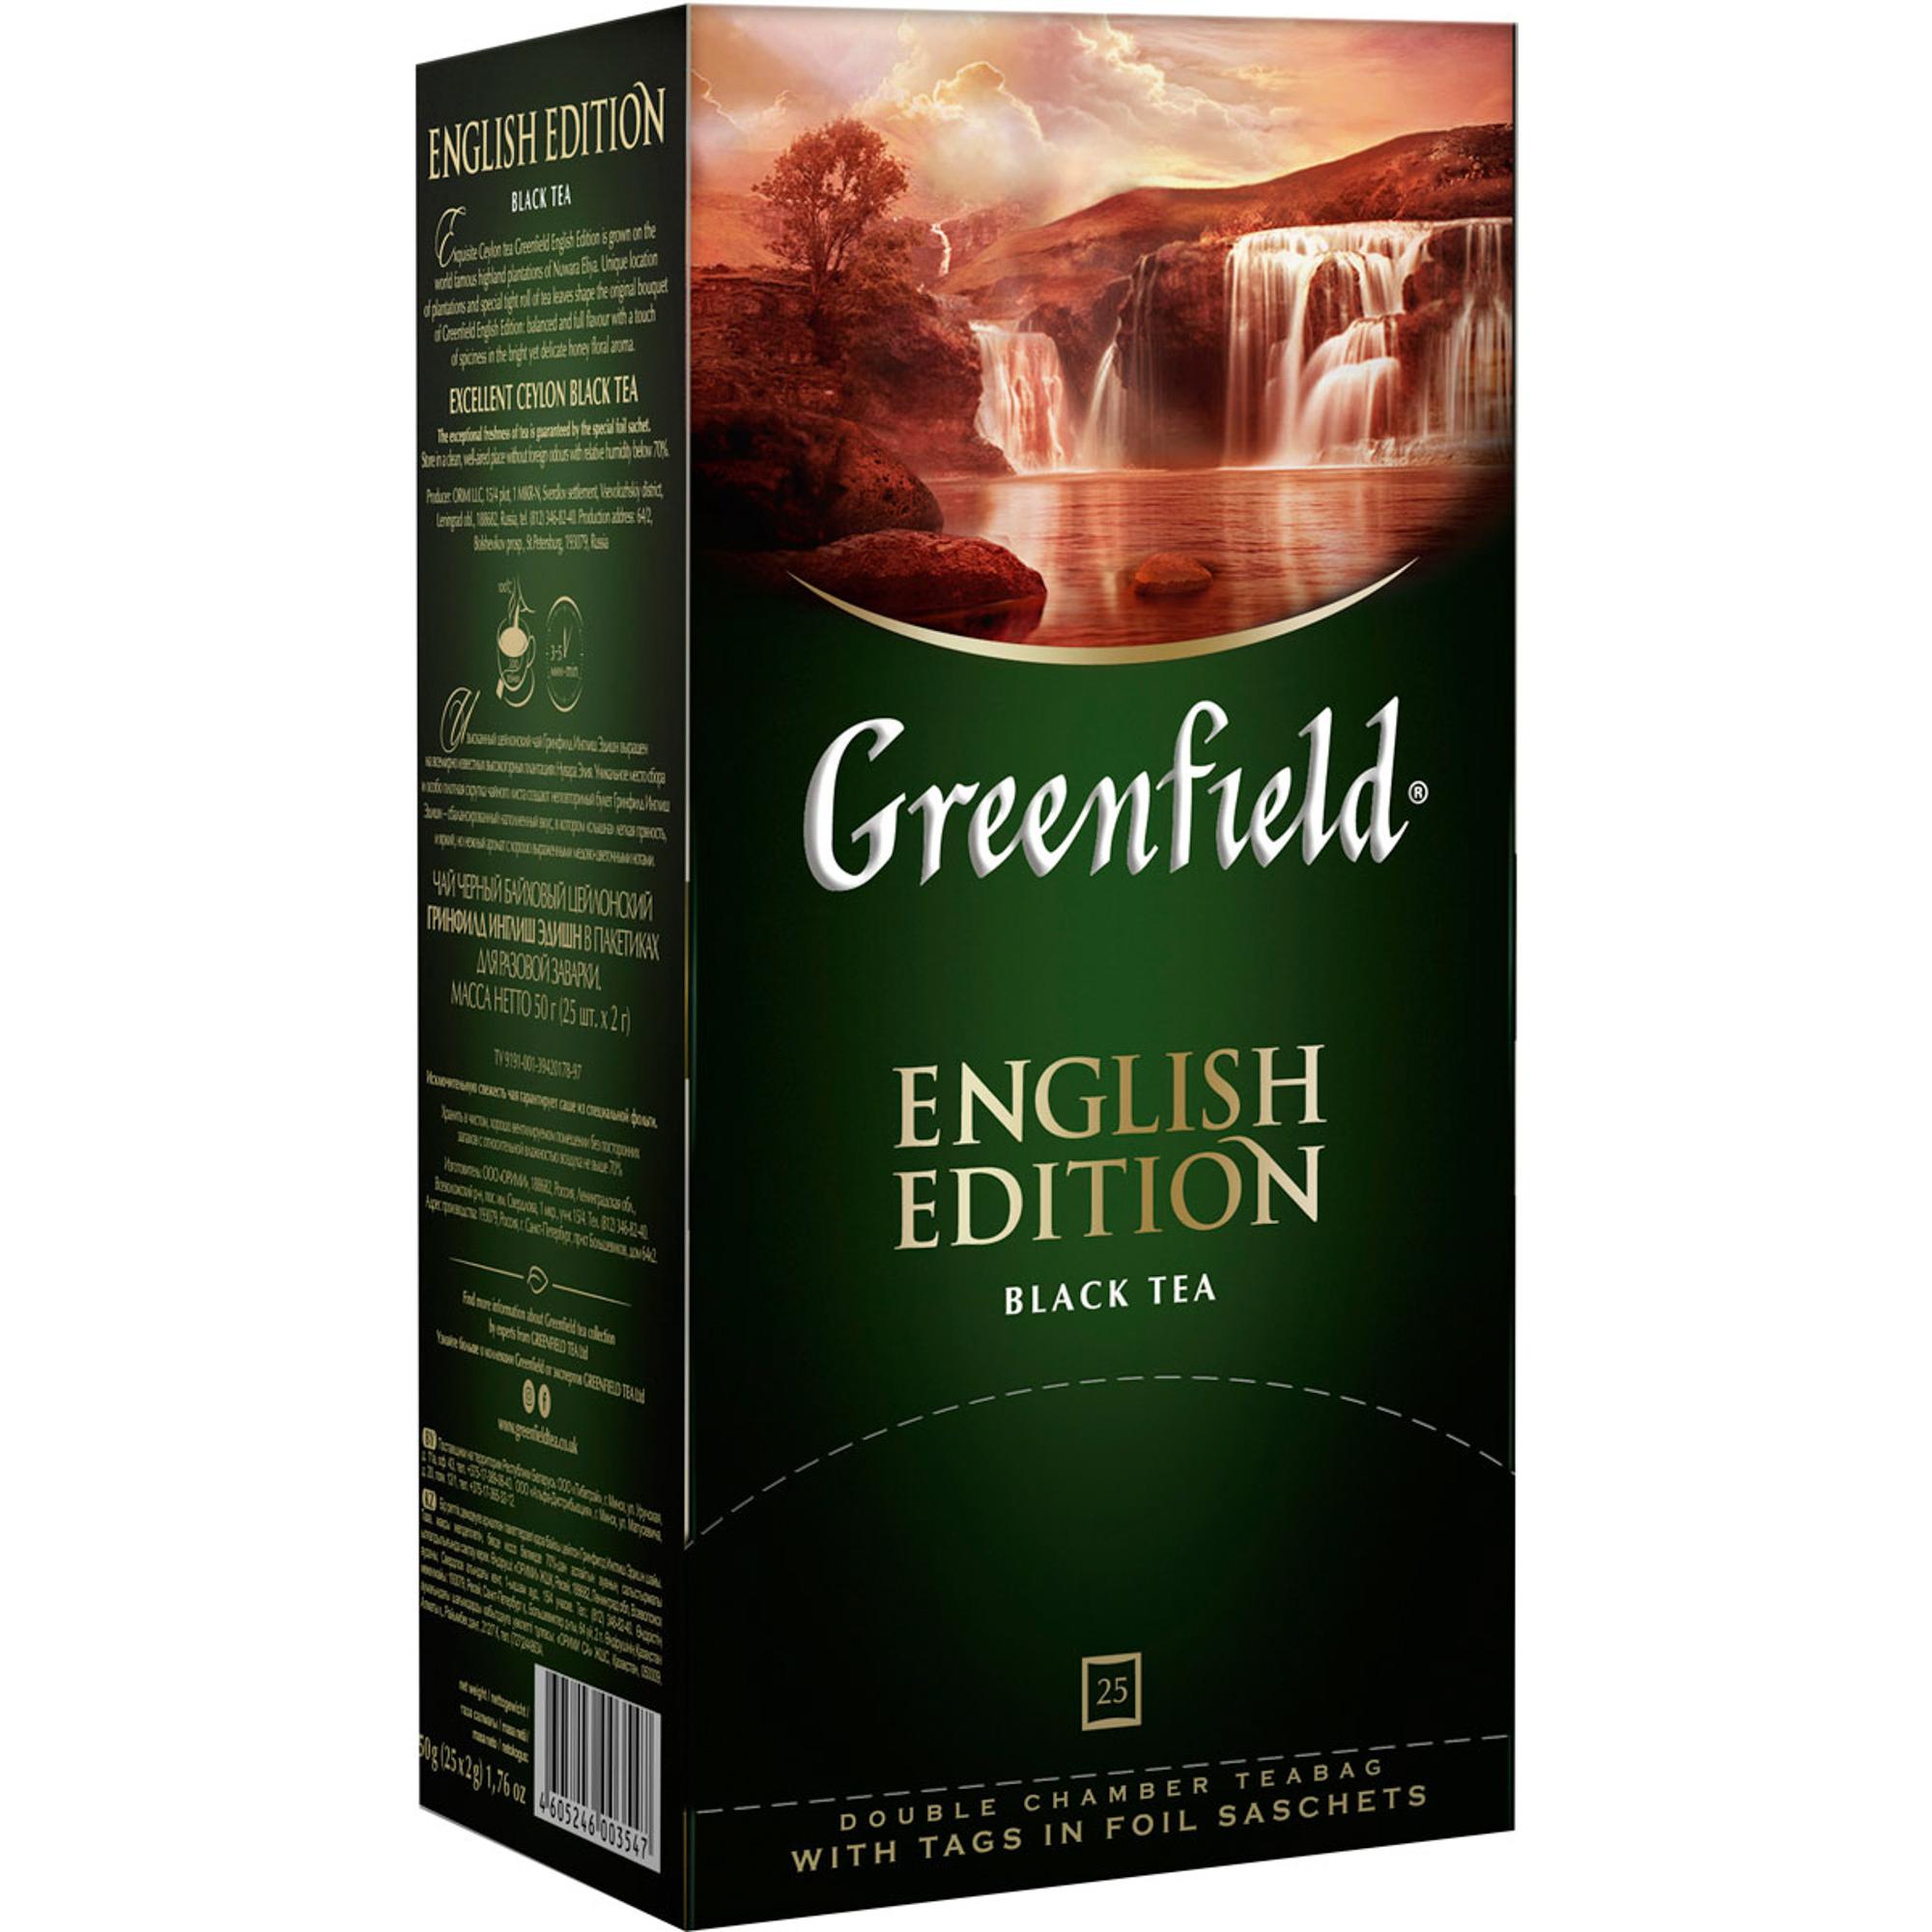 Чай черный Greenfield English Edition 25 пакетиков чай черный greenfield magic yunnan 25 пакетиков